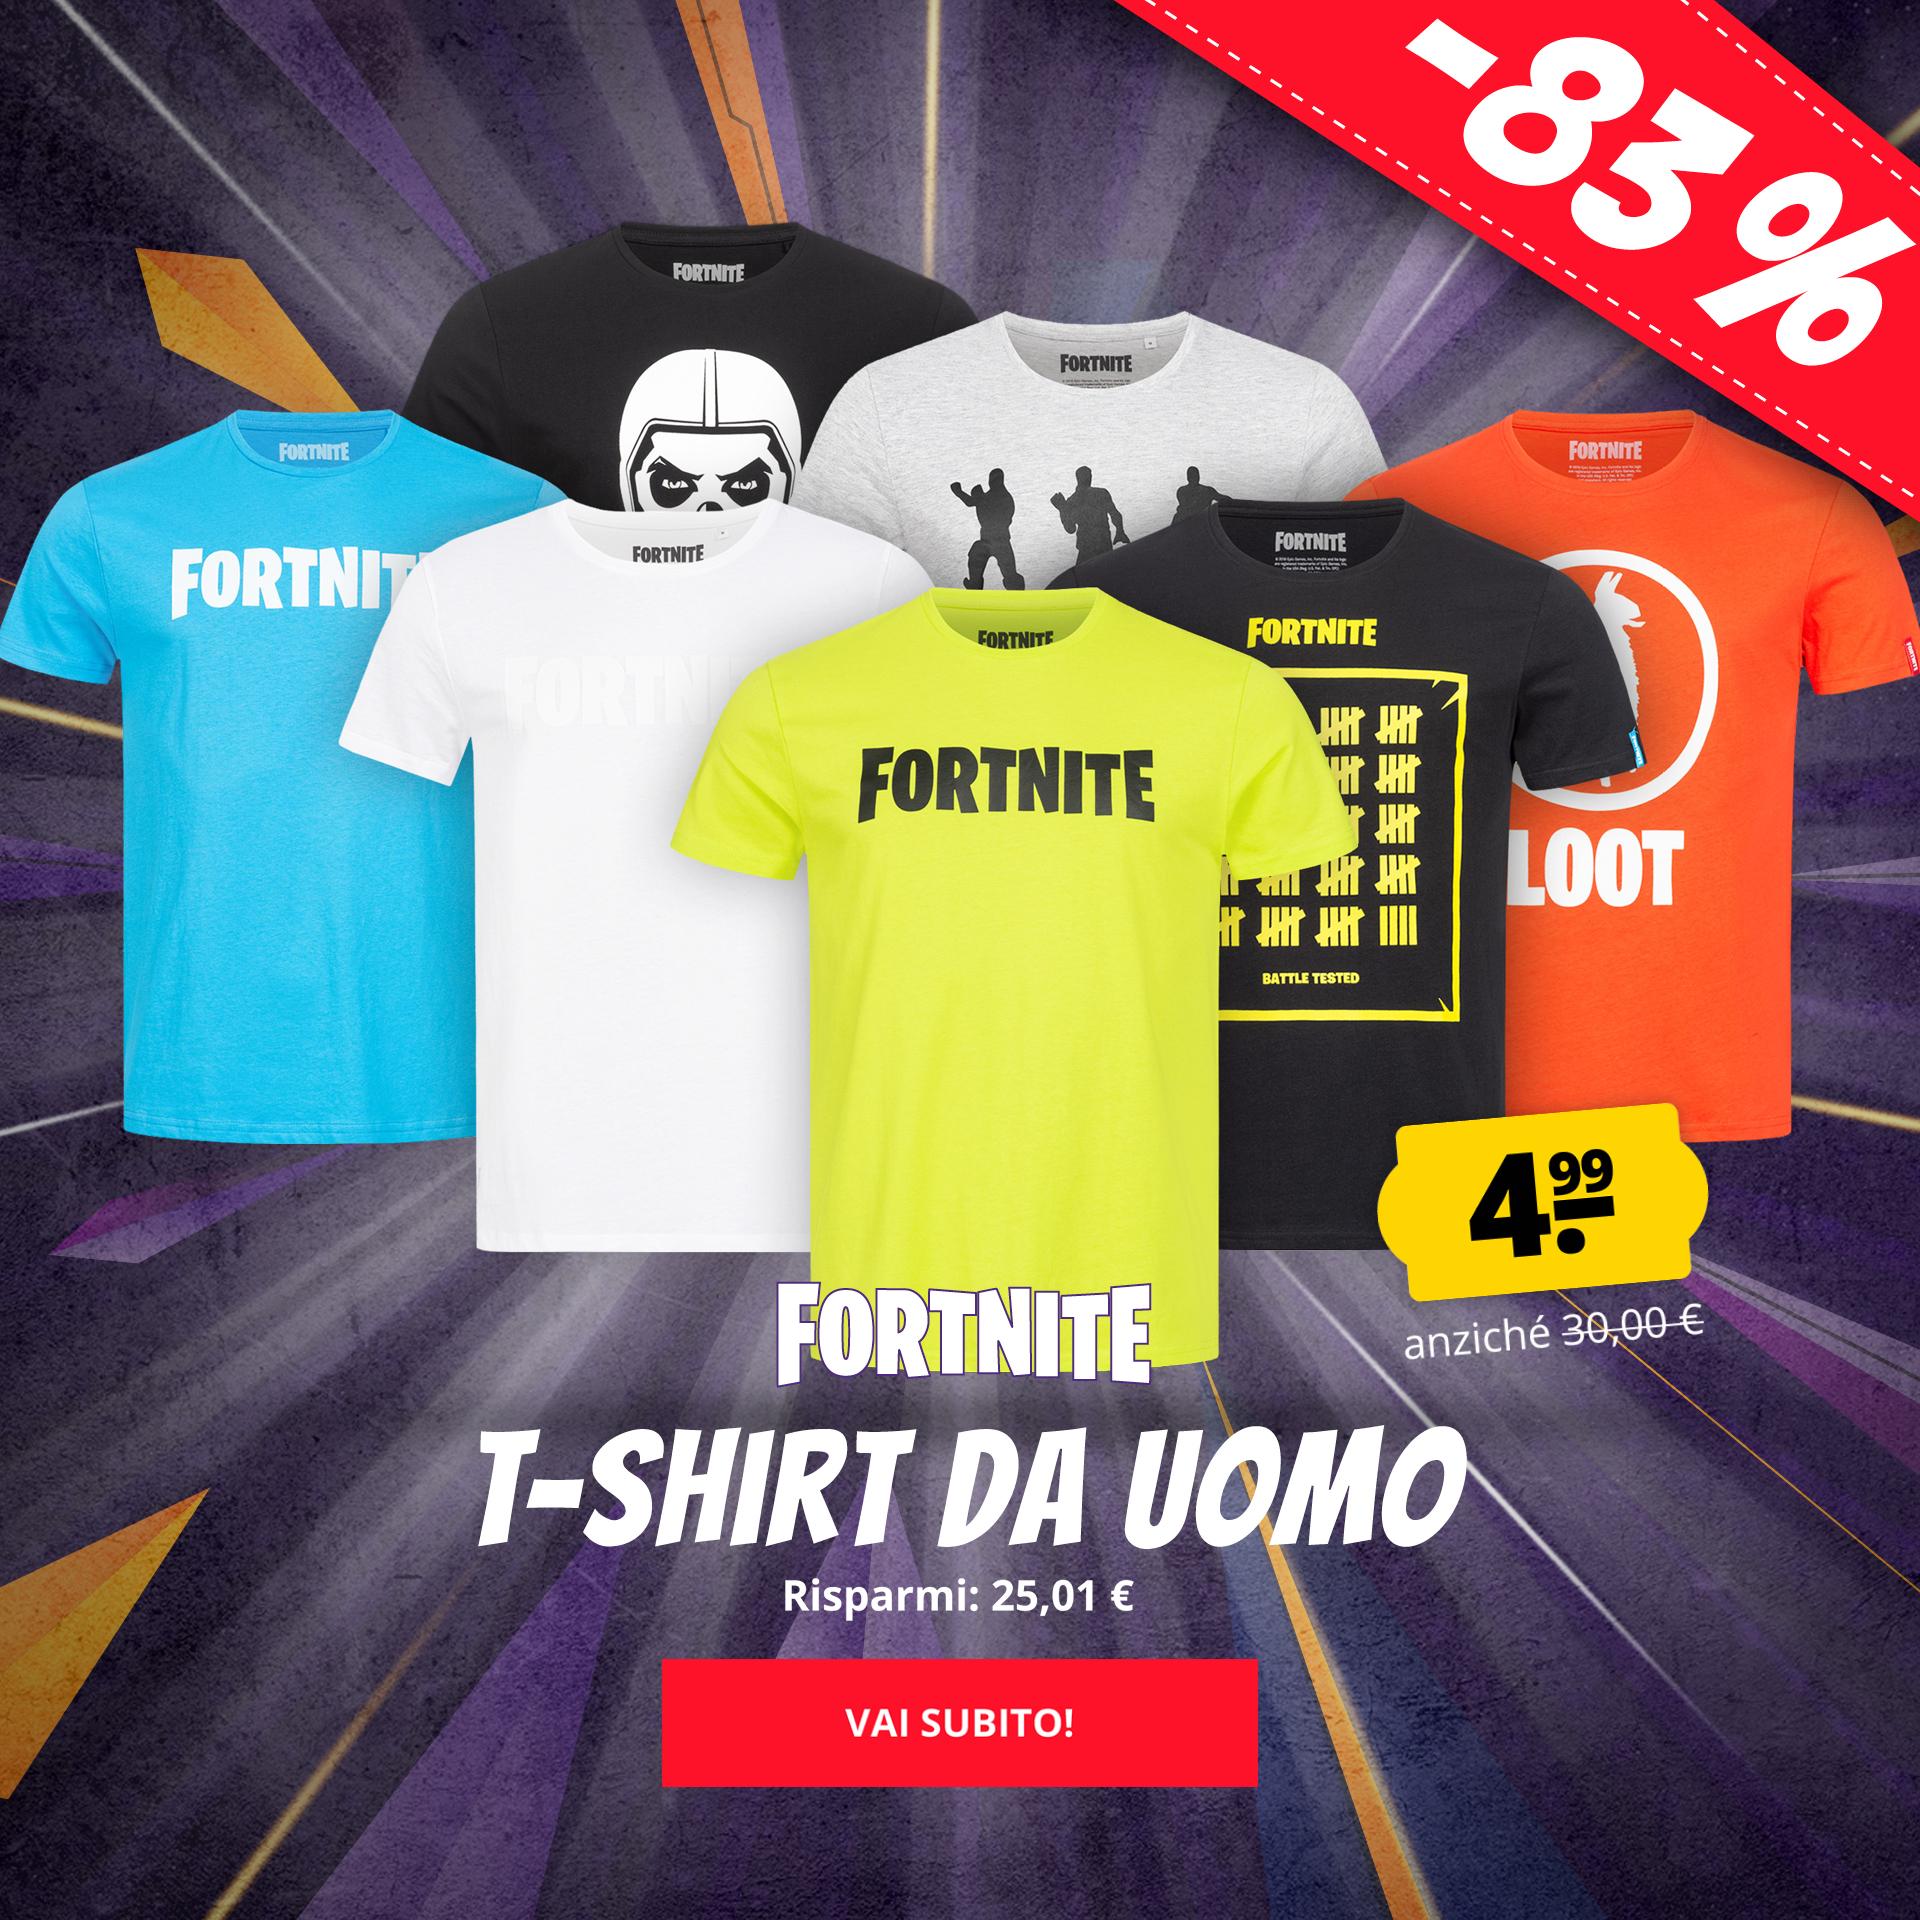 FORTNITE T-shirt da uomo solo 4,99 €